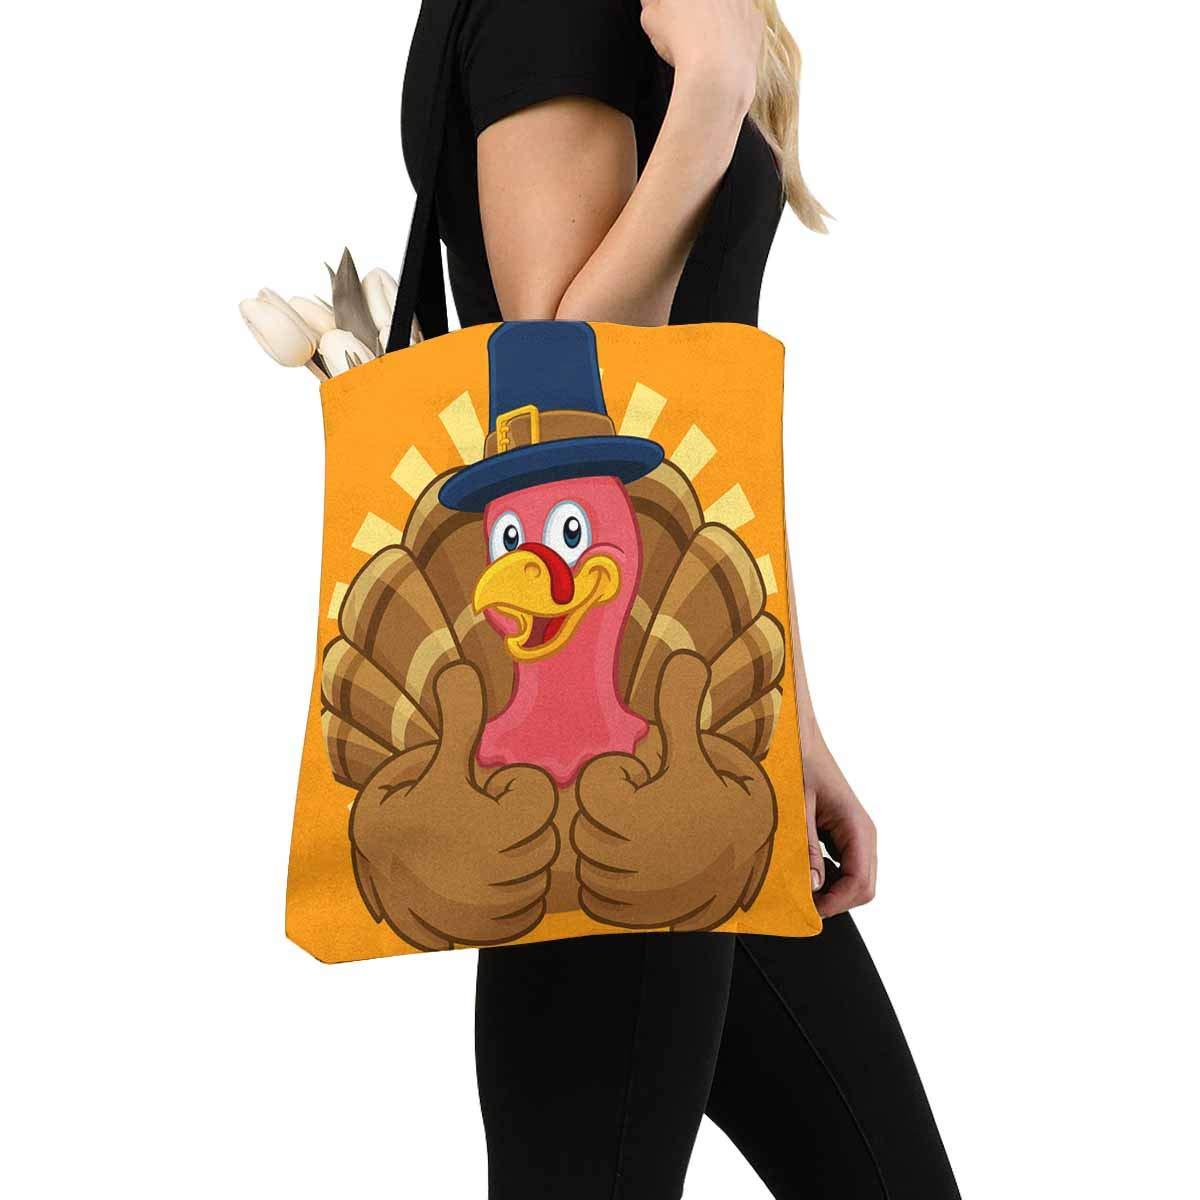 Funny Design Canvas Tote Bag Handbag Purse for Women